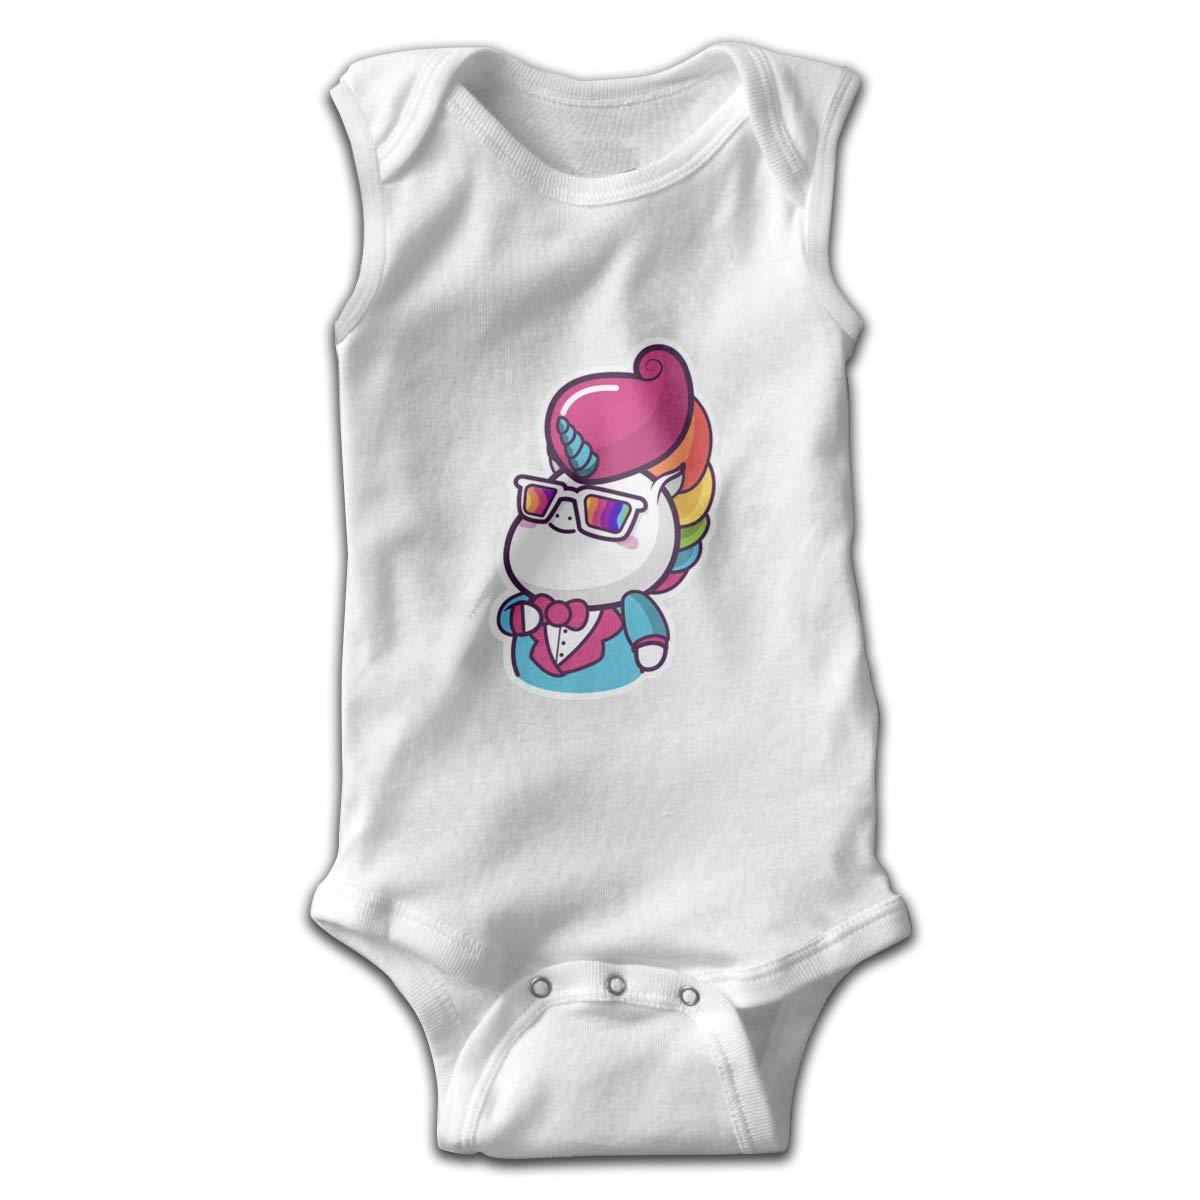 Dfenere Magical Unicorn2 Newborn Baby No Sleeve Bodysuit Romper Infant Summer Clothing Black